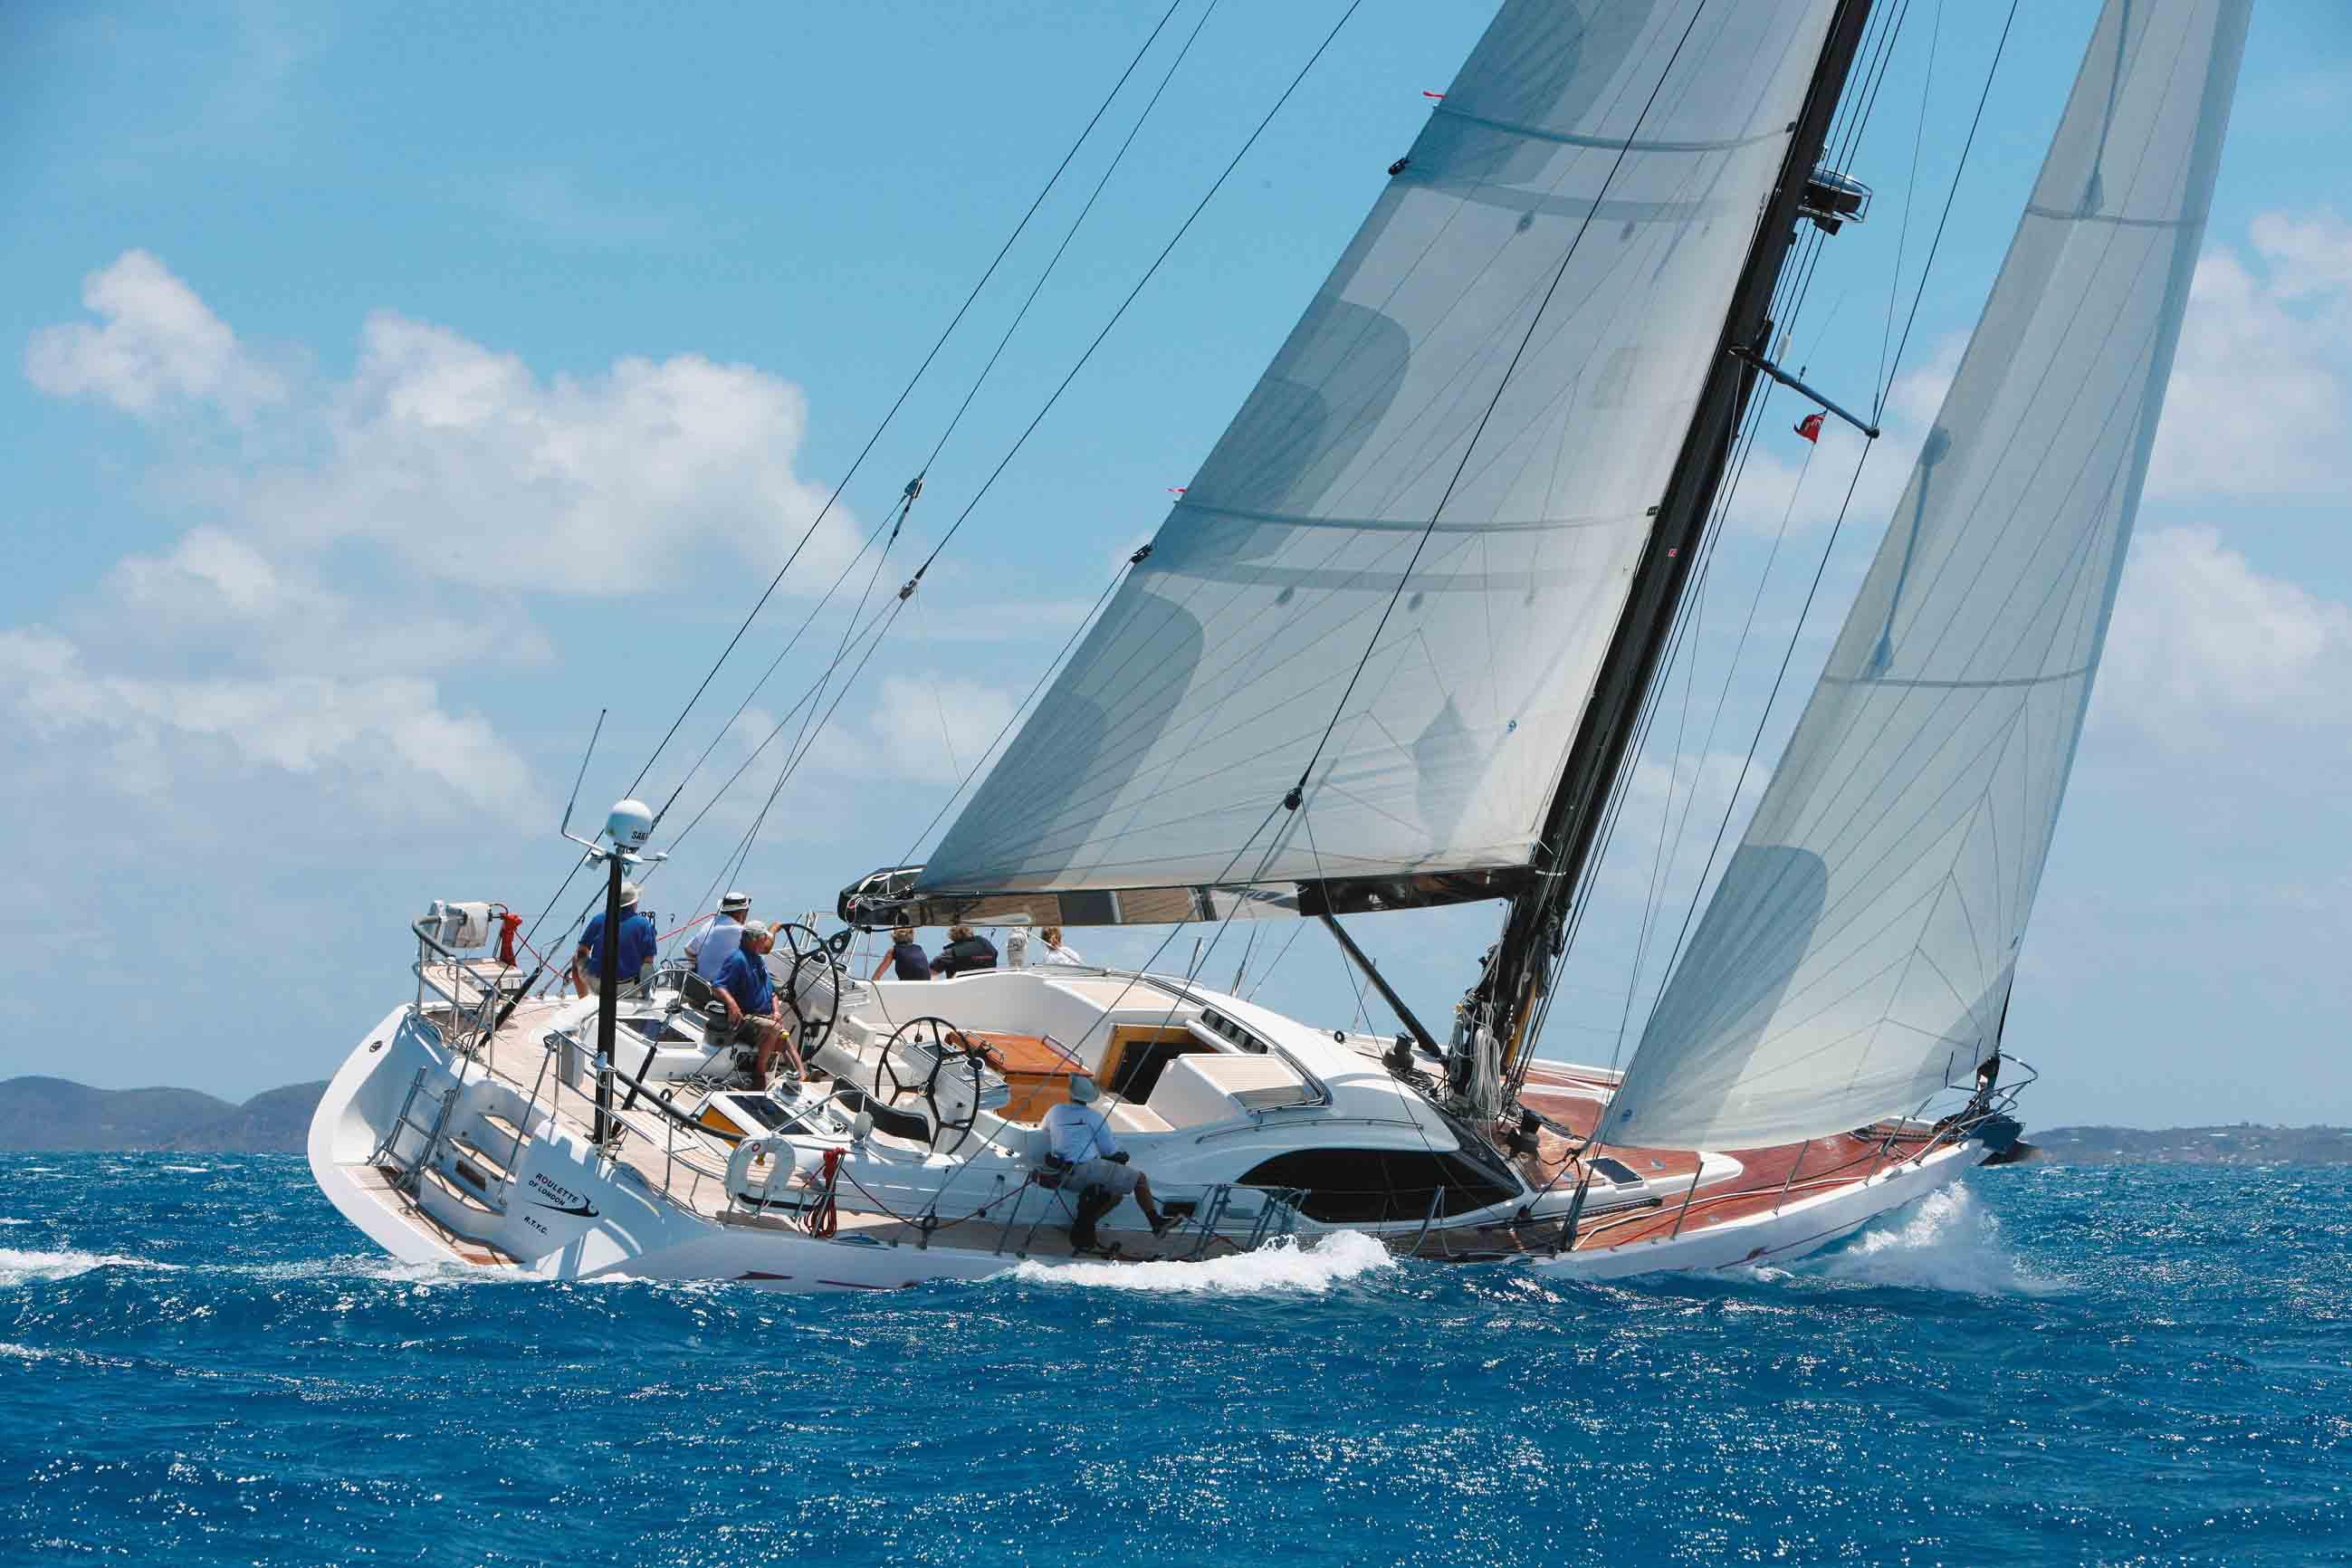 Sailing-Boat-Hd-Wallpapers-Free-Download-9